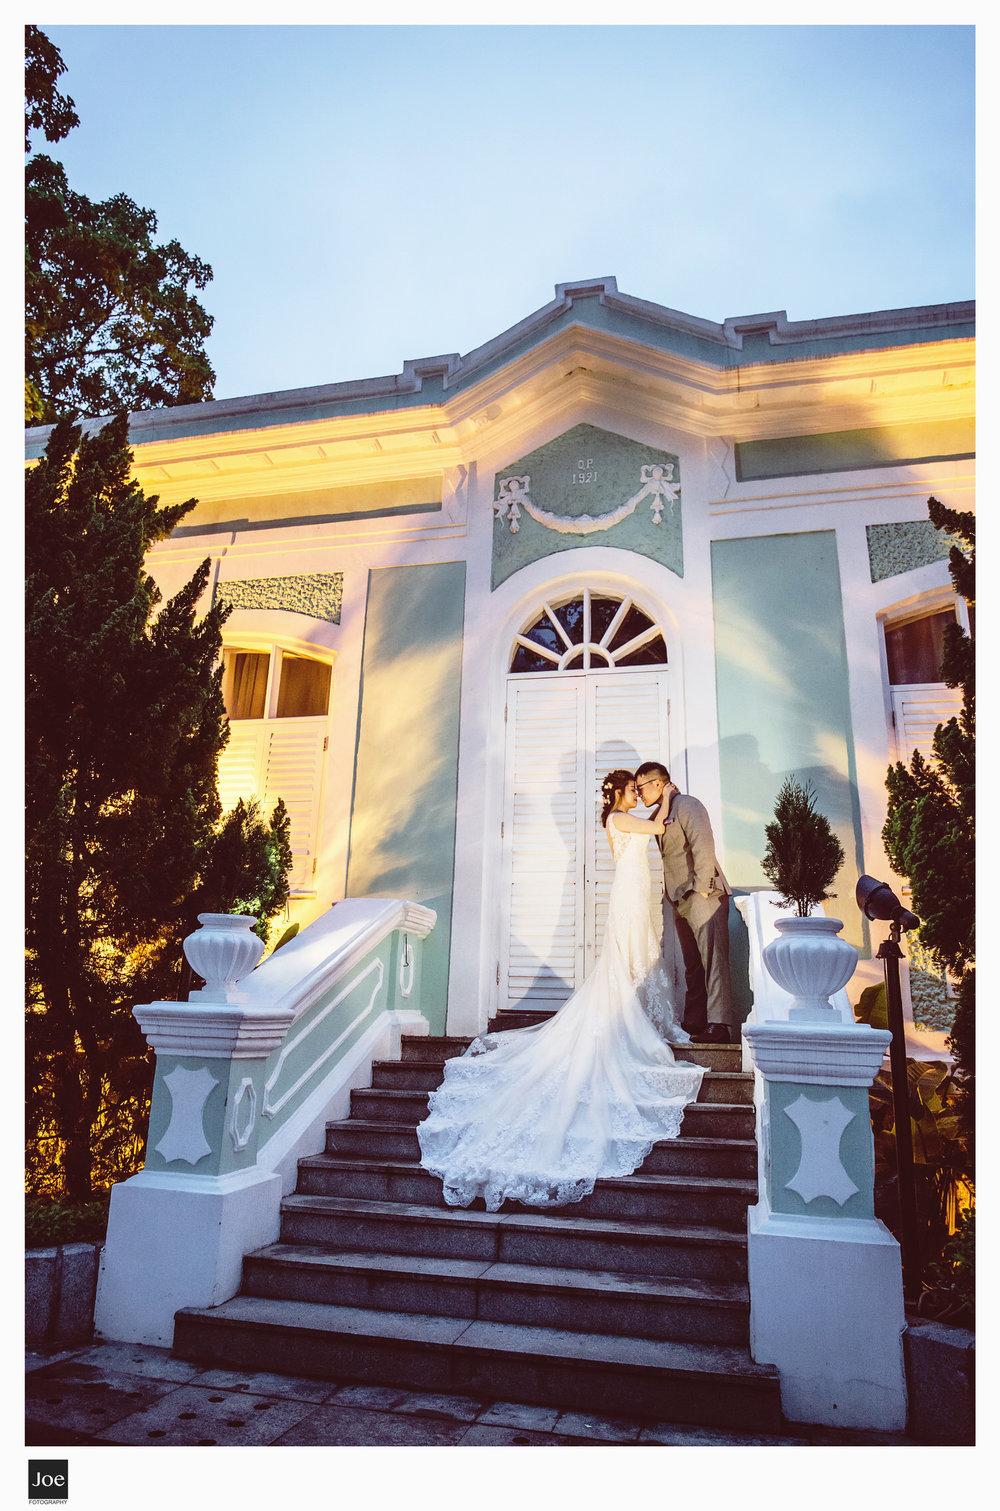 084-casas-museu-da-taipa-macau-pre-wedding-jie-min-joe-fotography.jpg